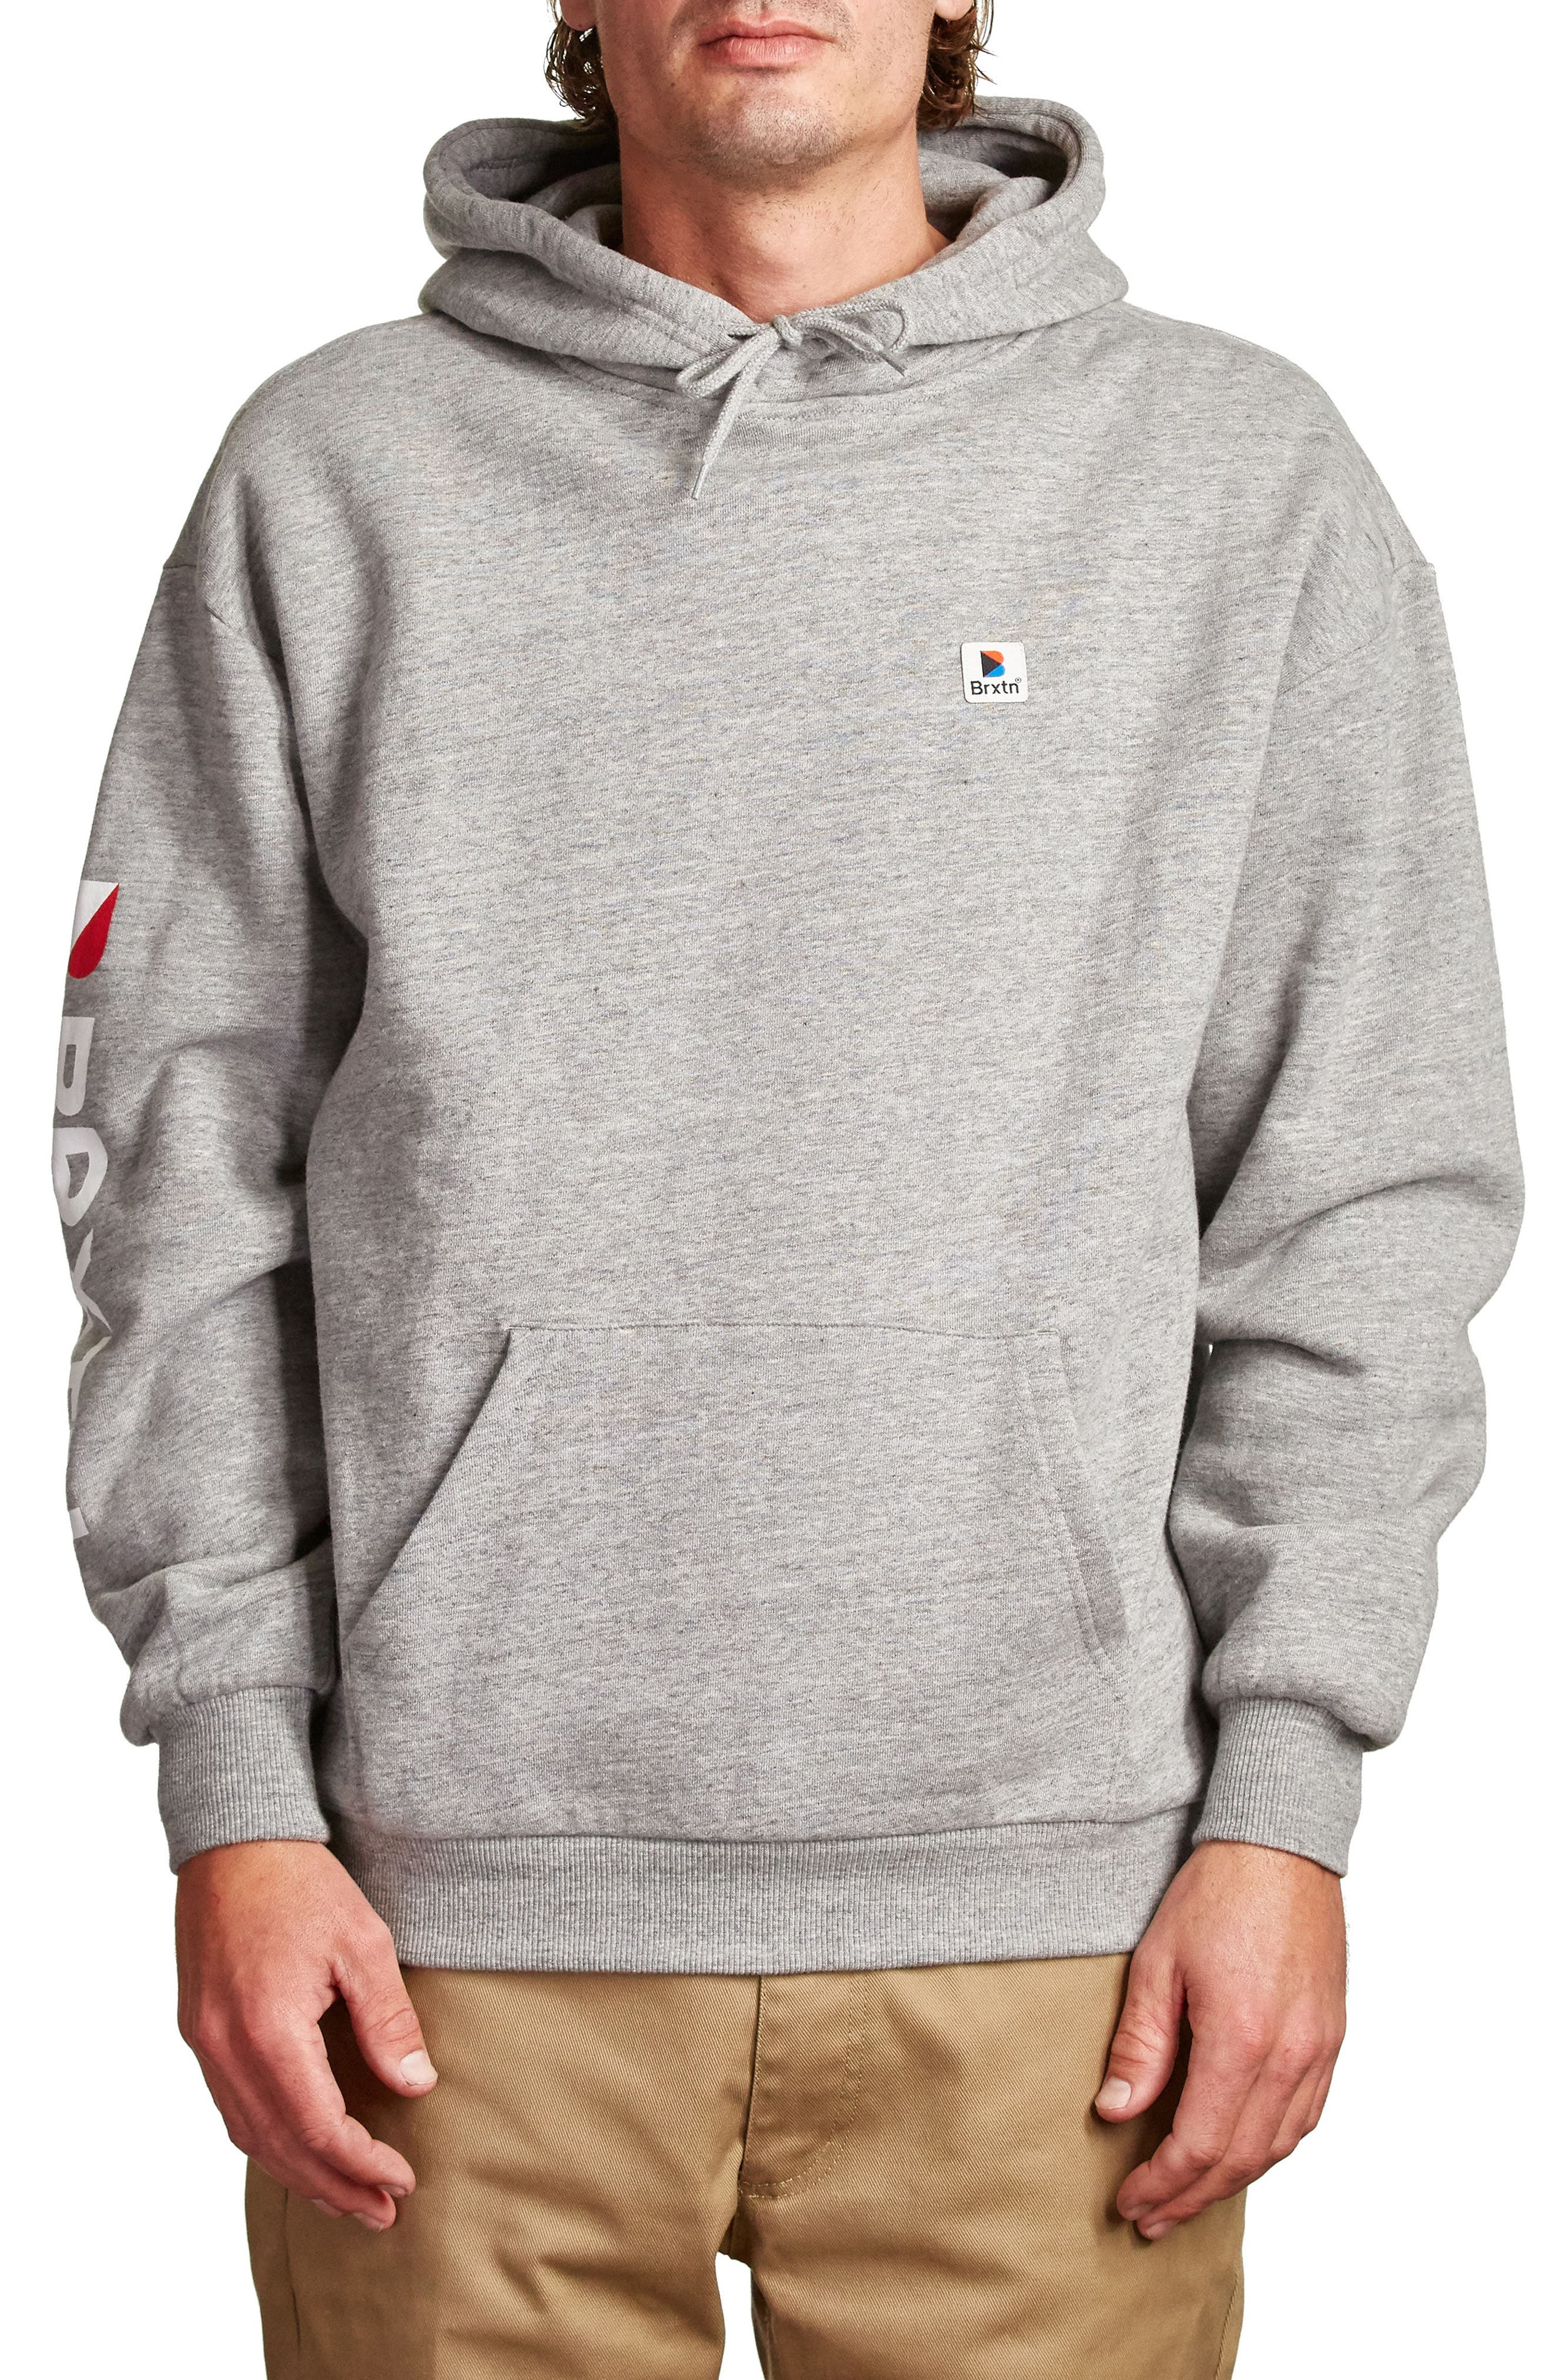 Stowell Hoodie Sweatshirt,                             Main thumbnail 1, color,                             Heather Grey